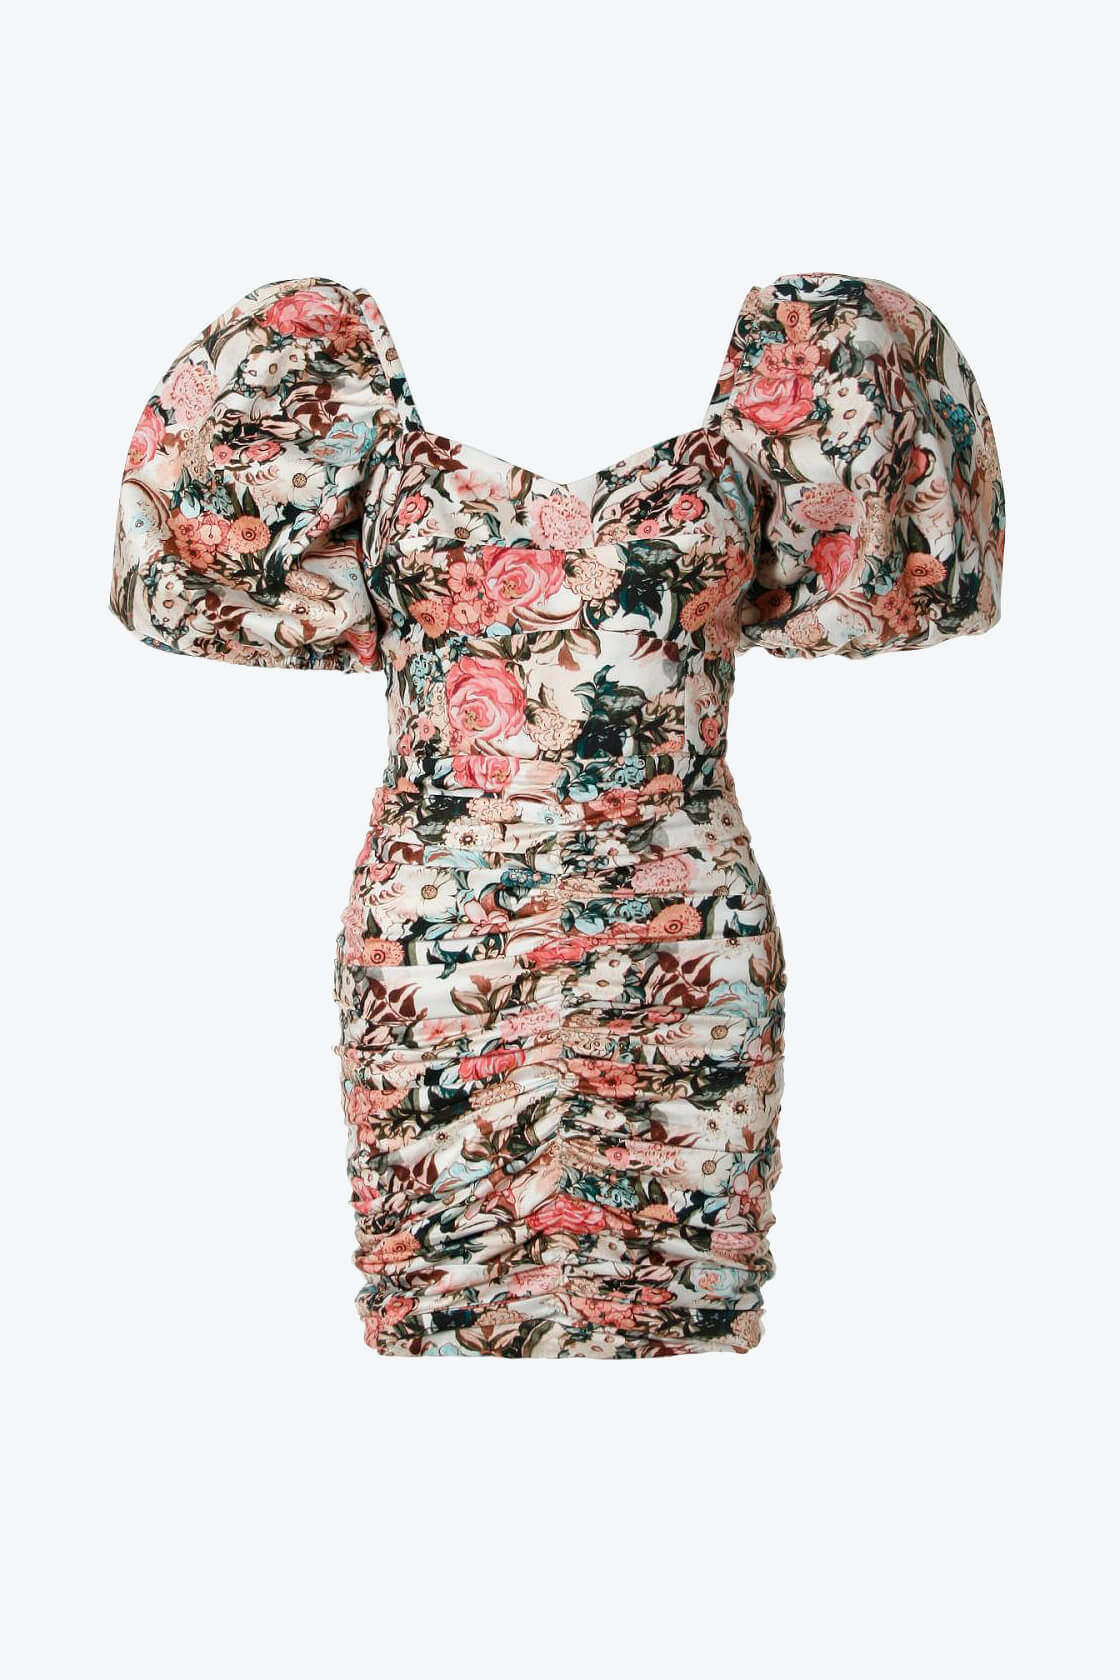 OL100002614 Dress Gracia Bridal Rose1